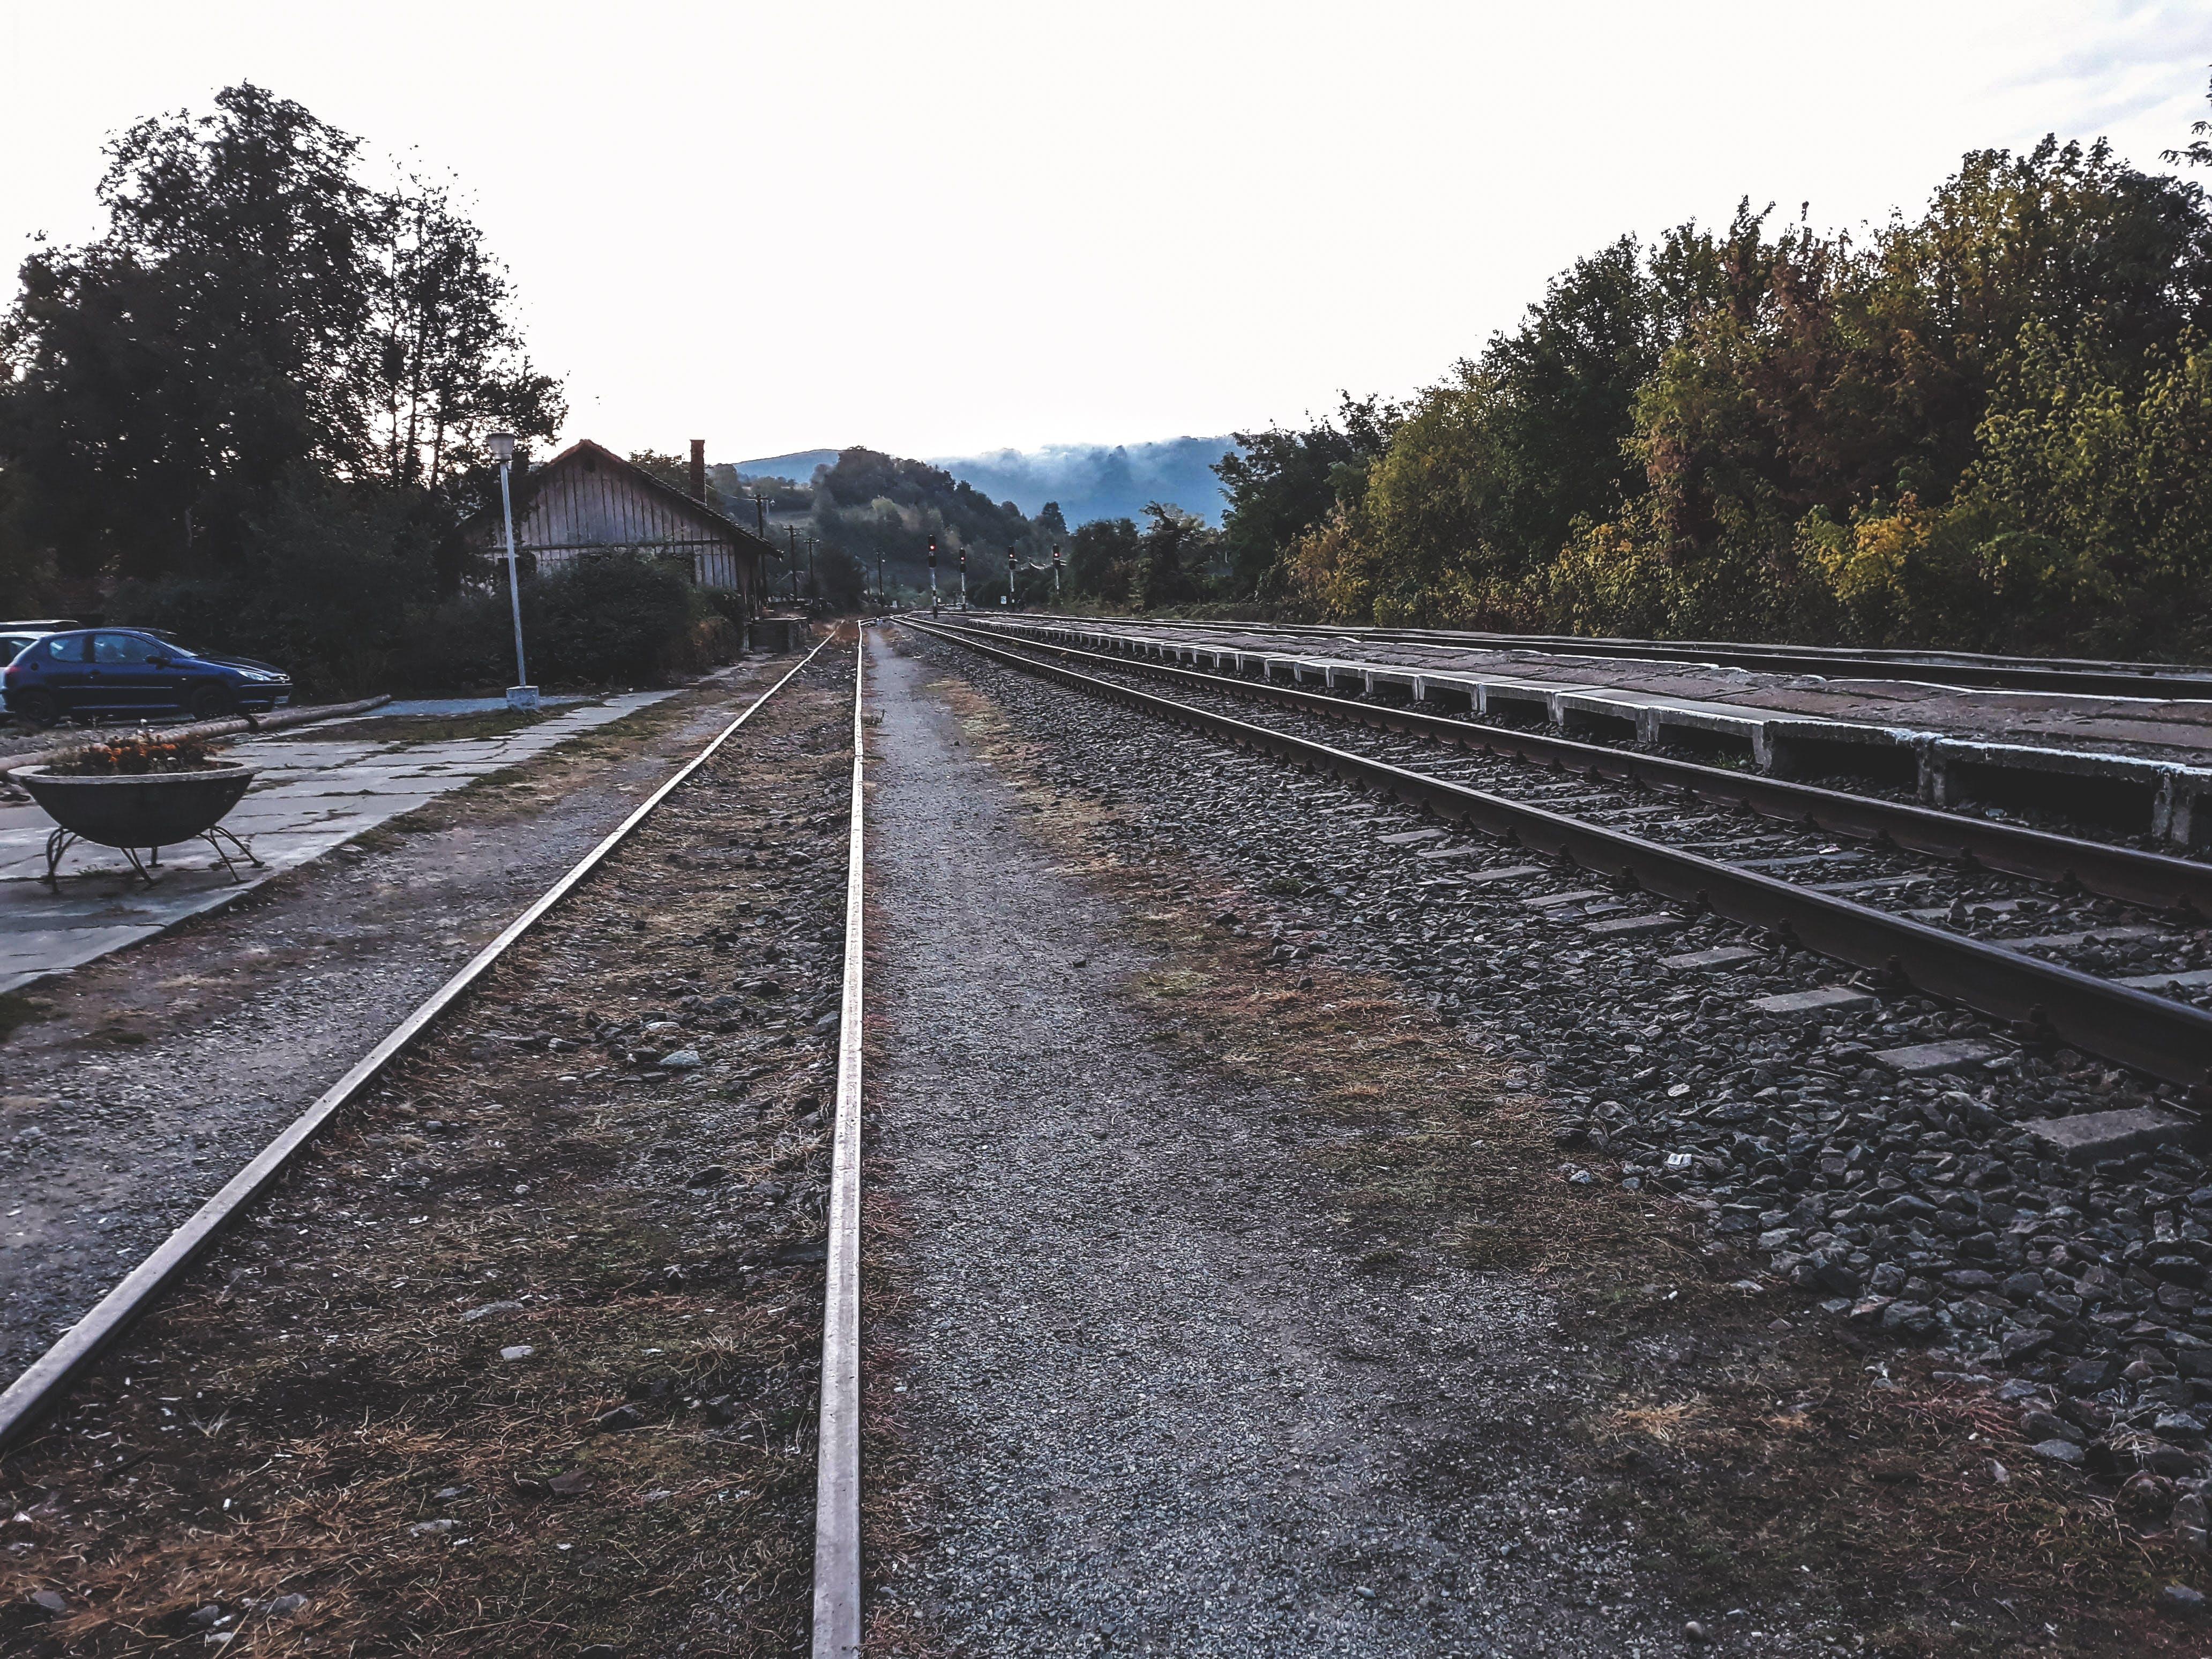 Free stock photo of early morning, rails, train tracks